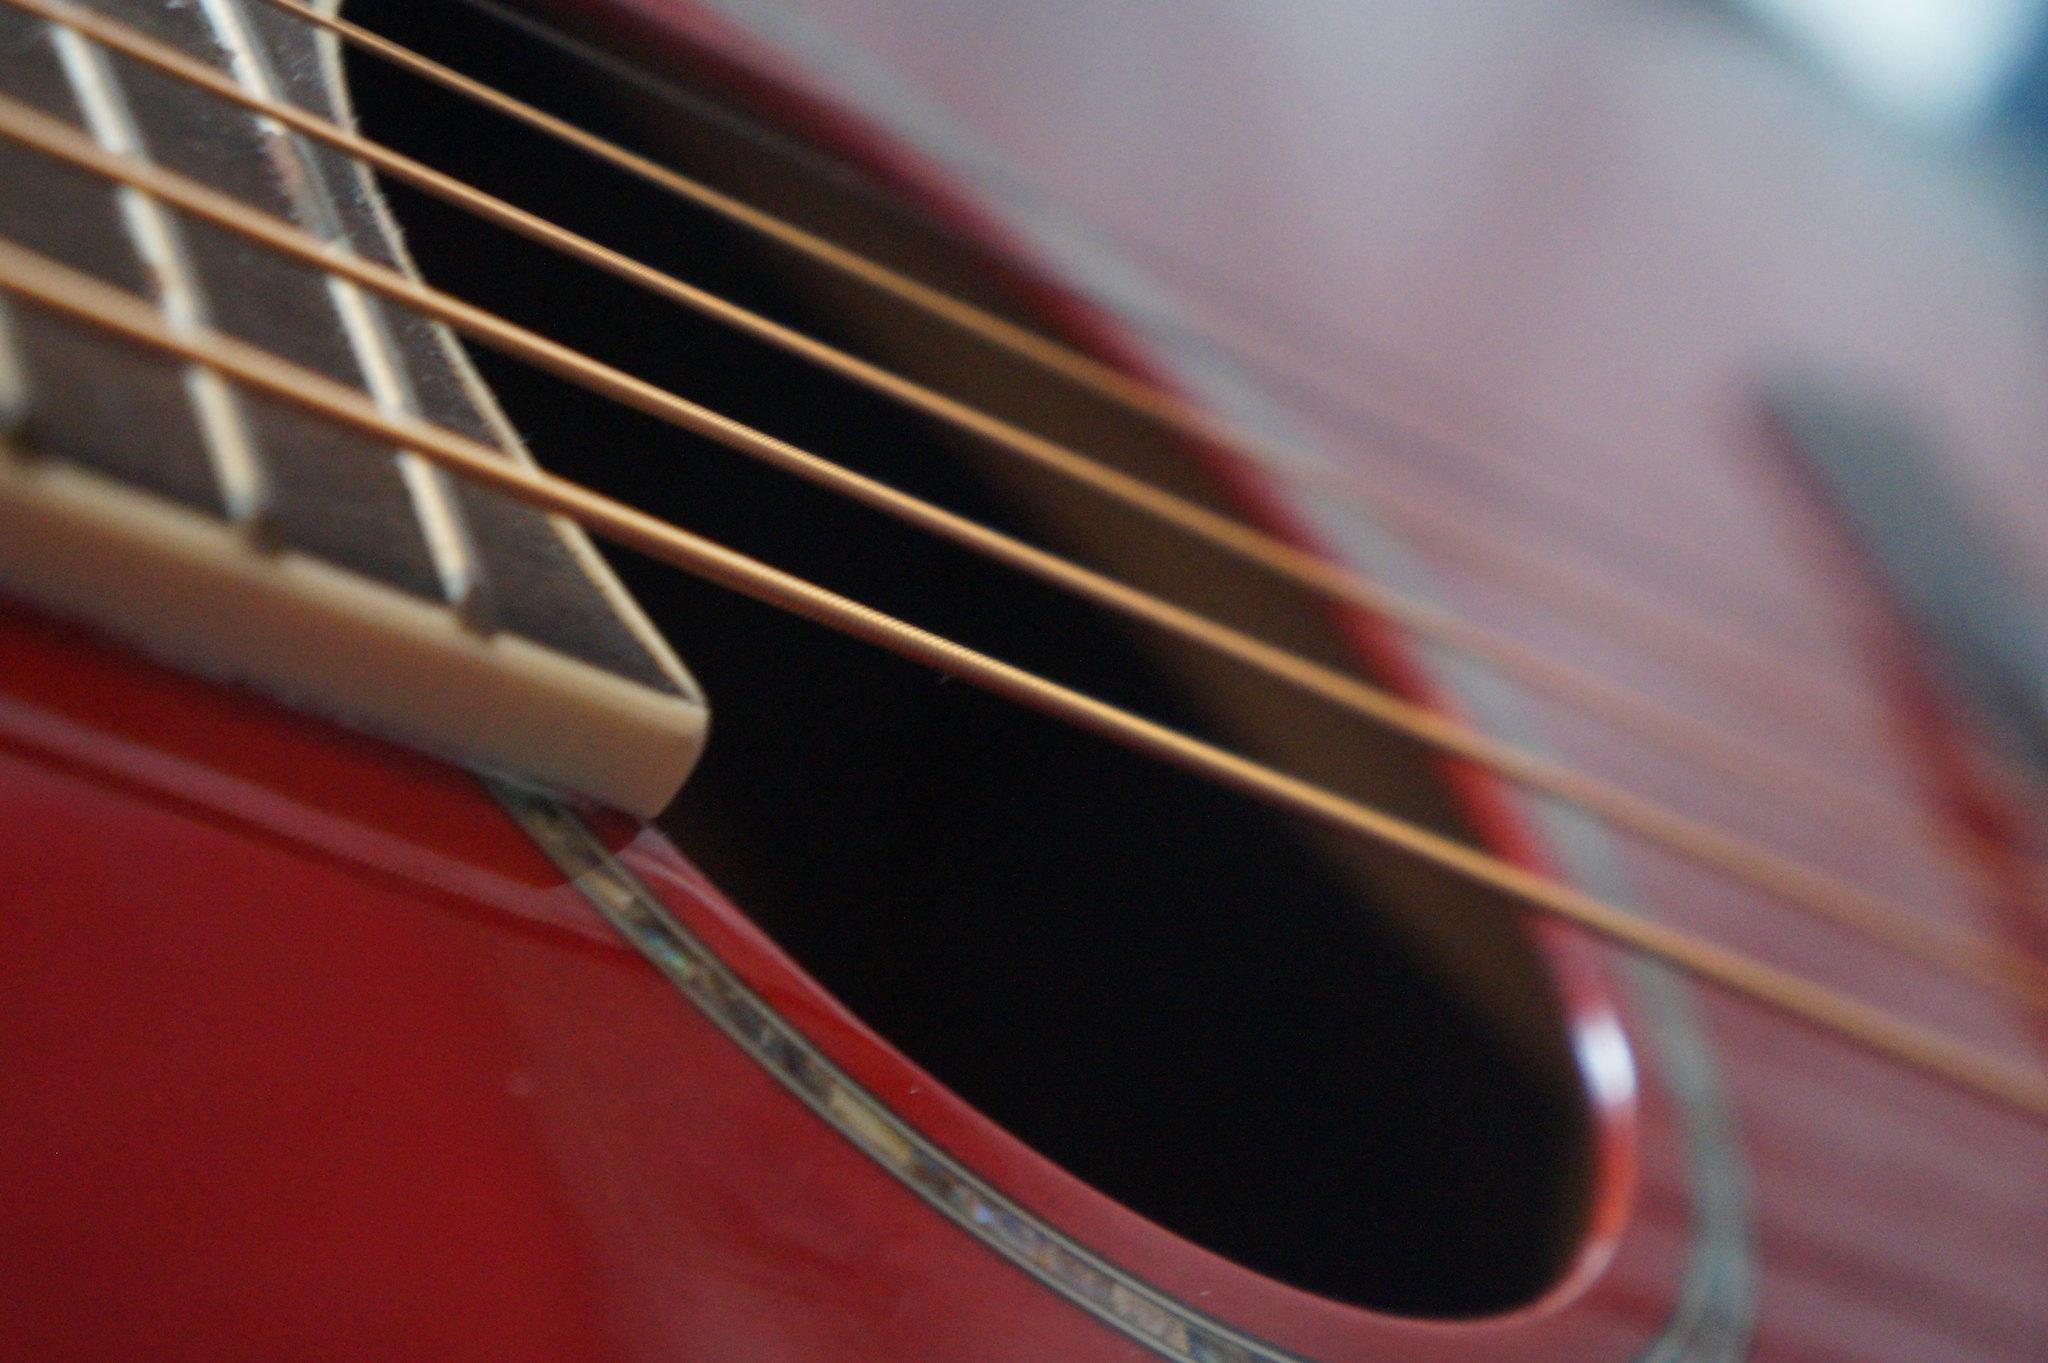 Classic Guitar Detail